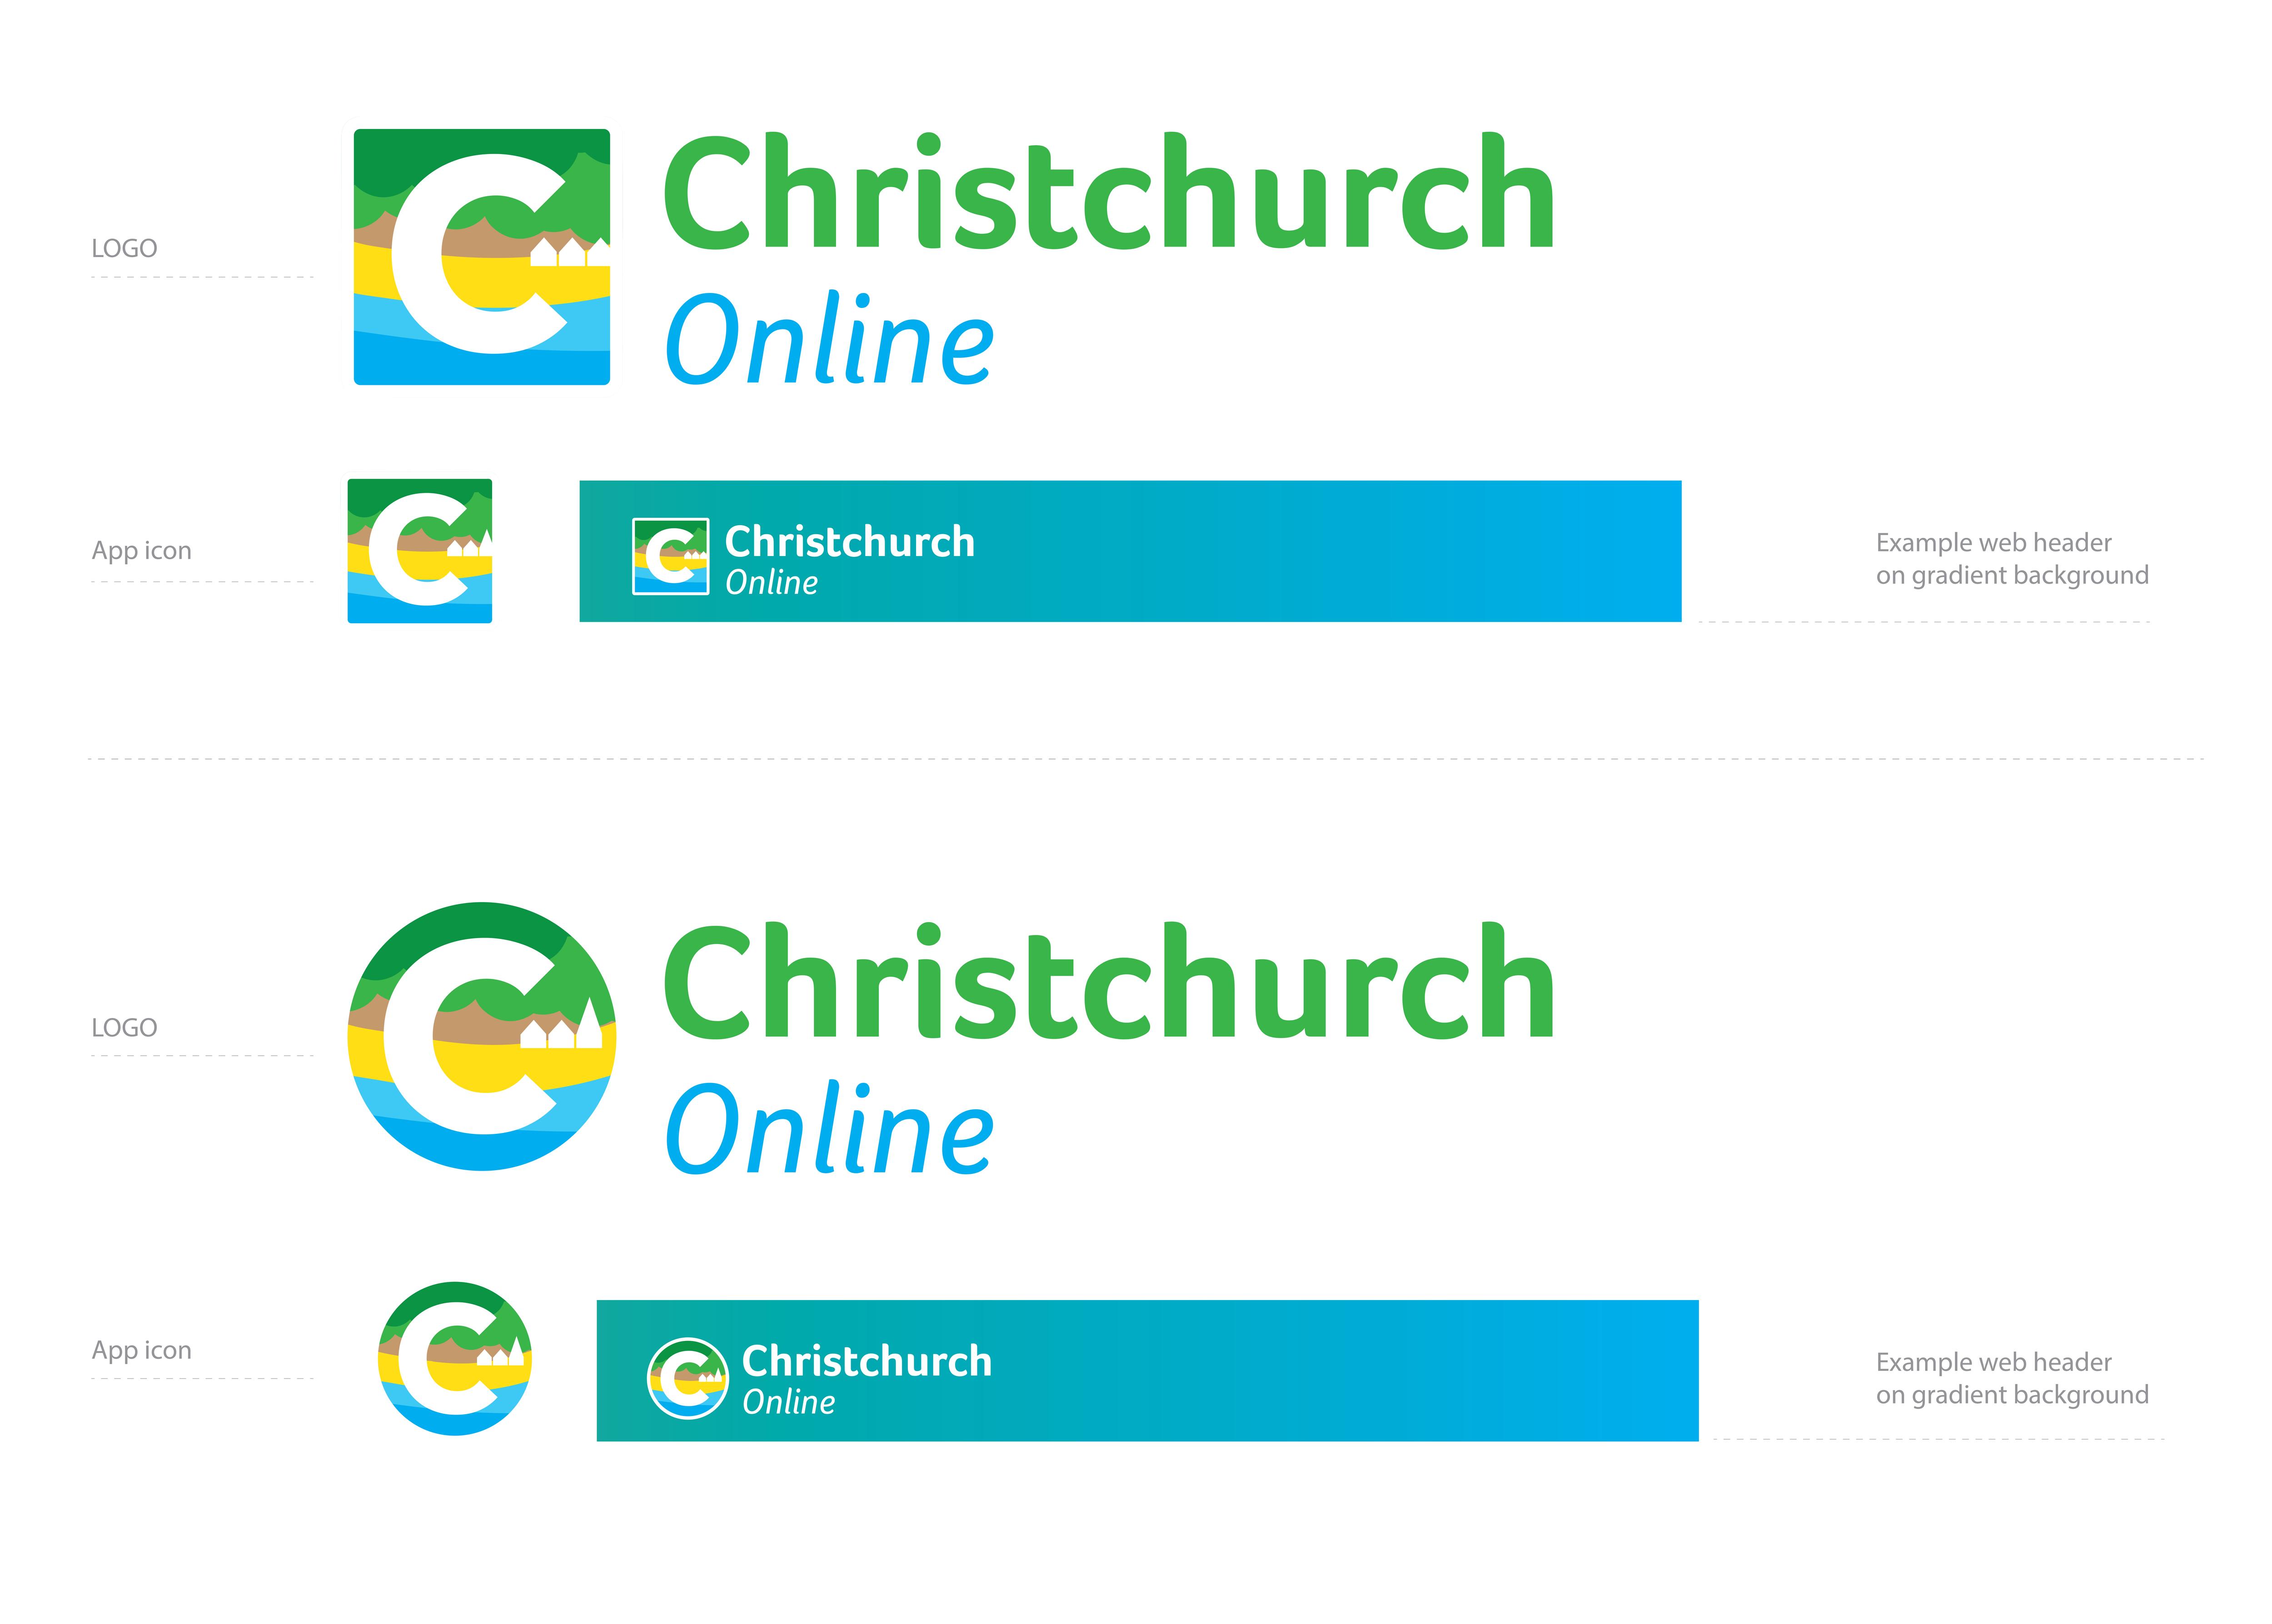 Colorful Playful App Icon Logo Design For Christchurch Online By Jane Designs Design 24673402